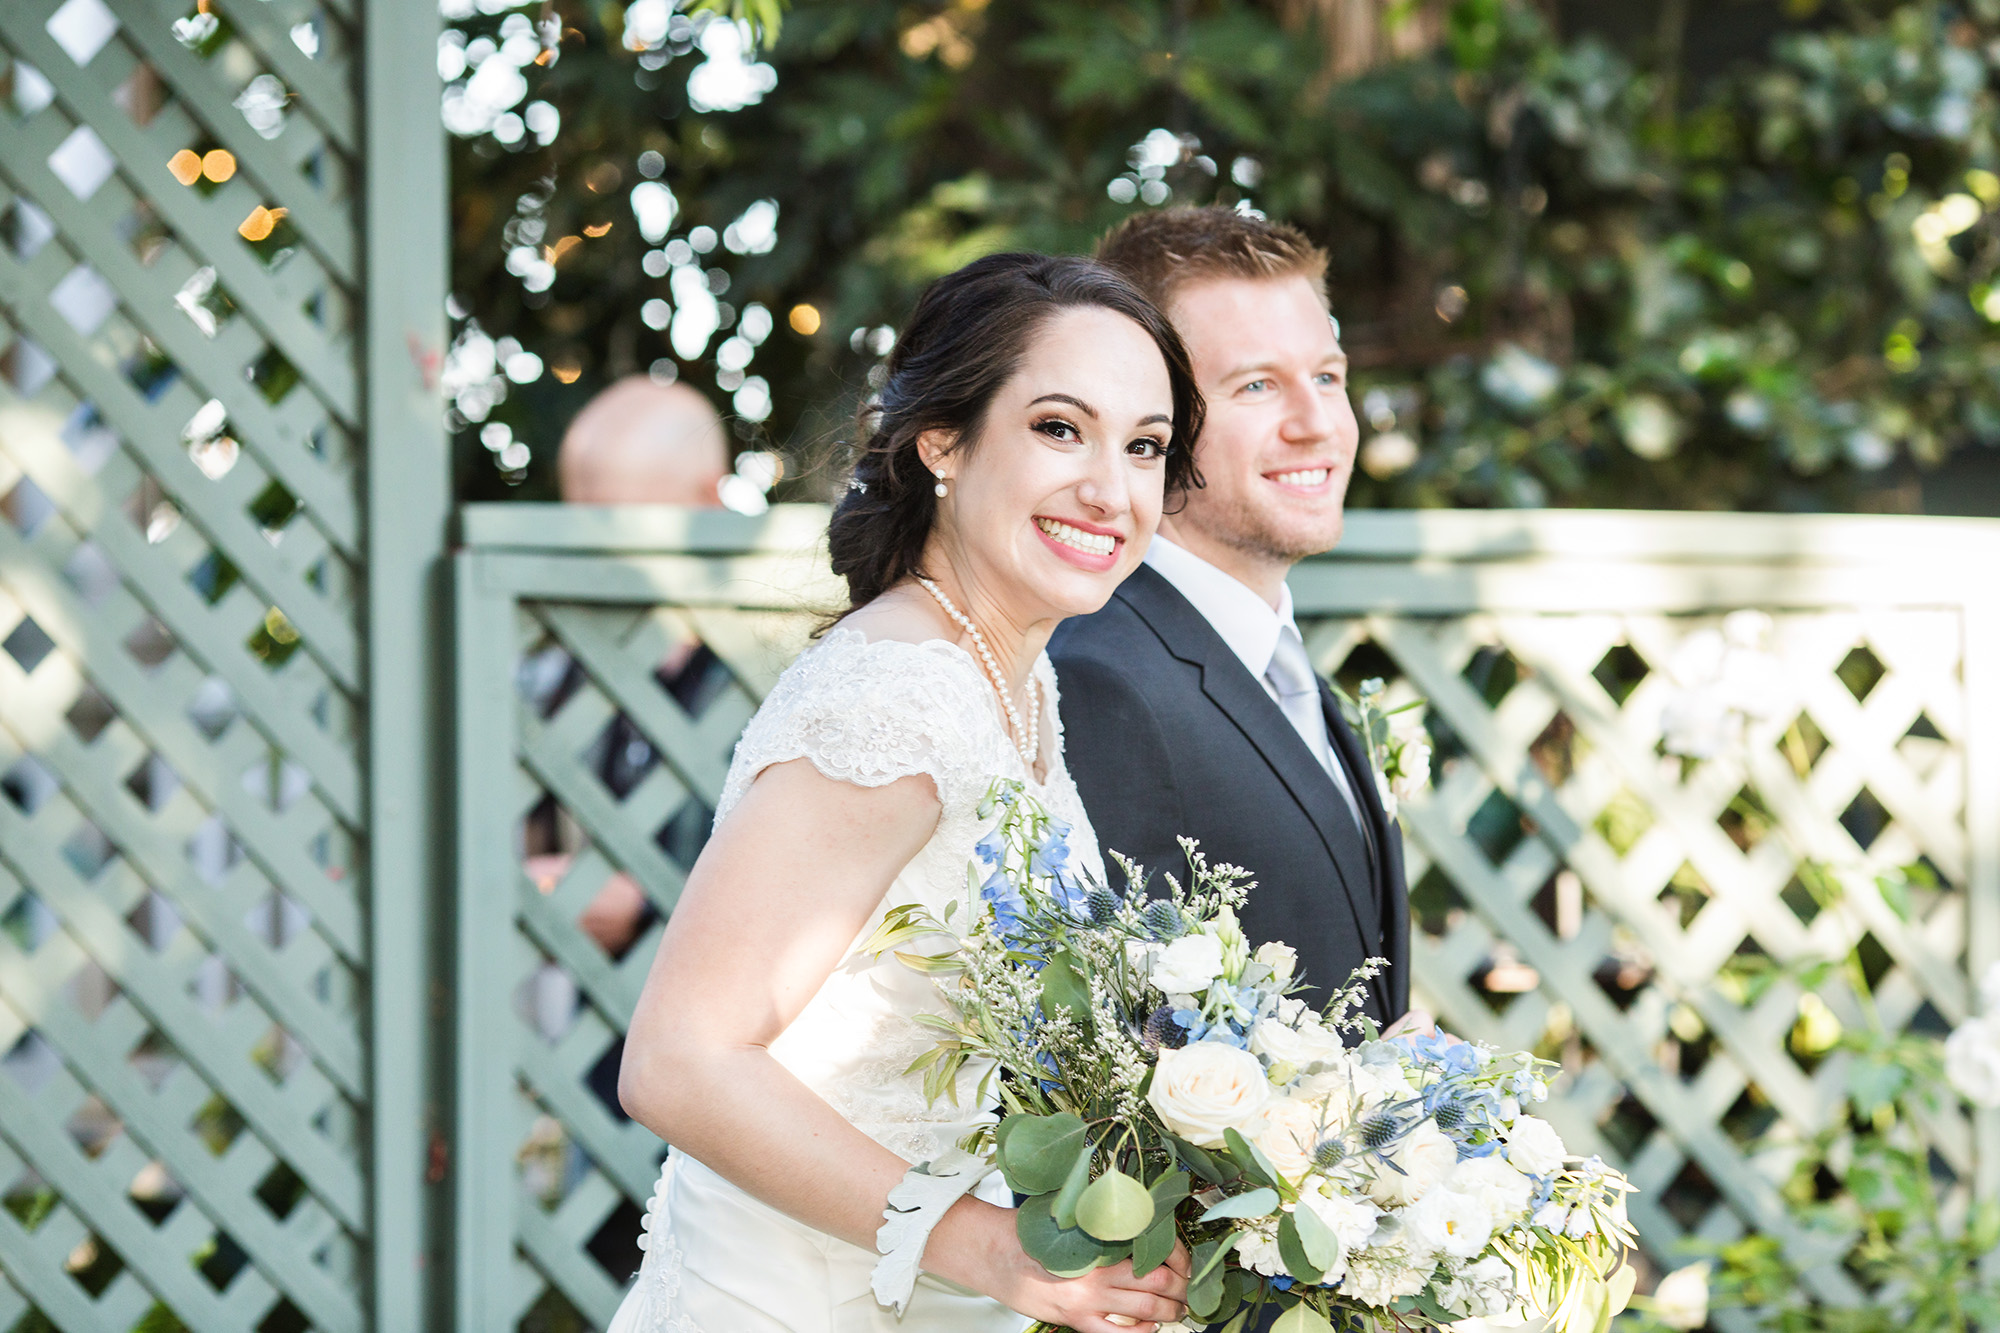 associate-photographer-christmas-house-wedding-carrie-vines-0050.jpg